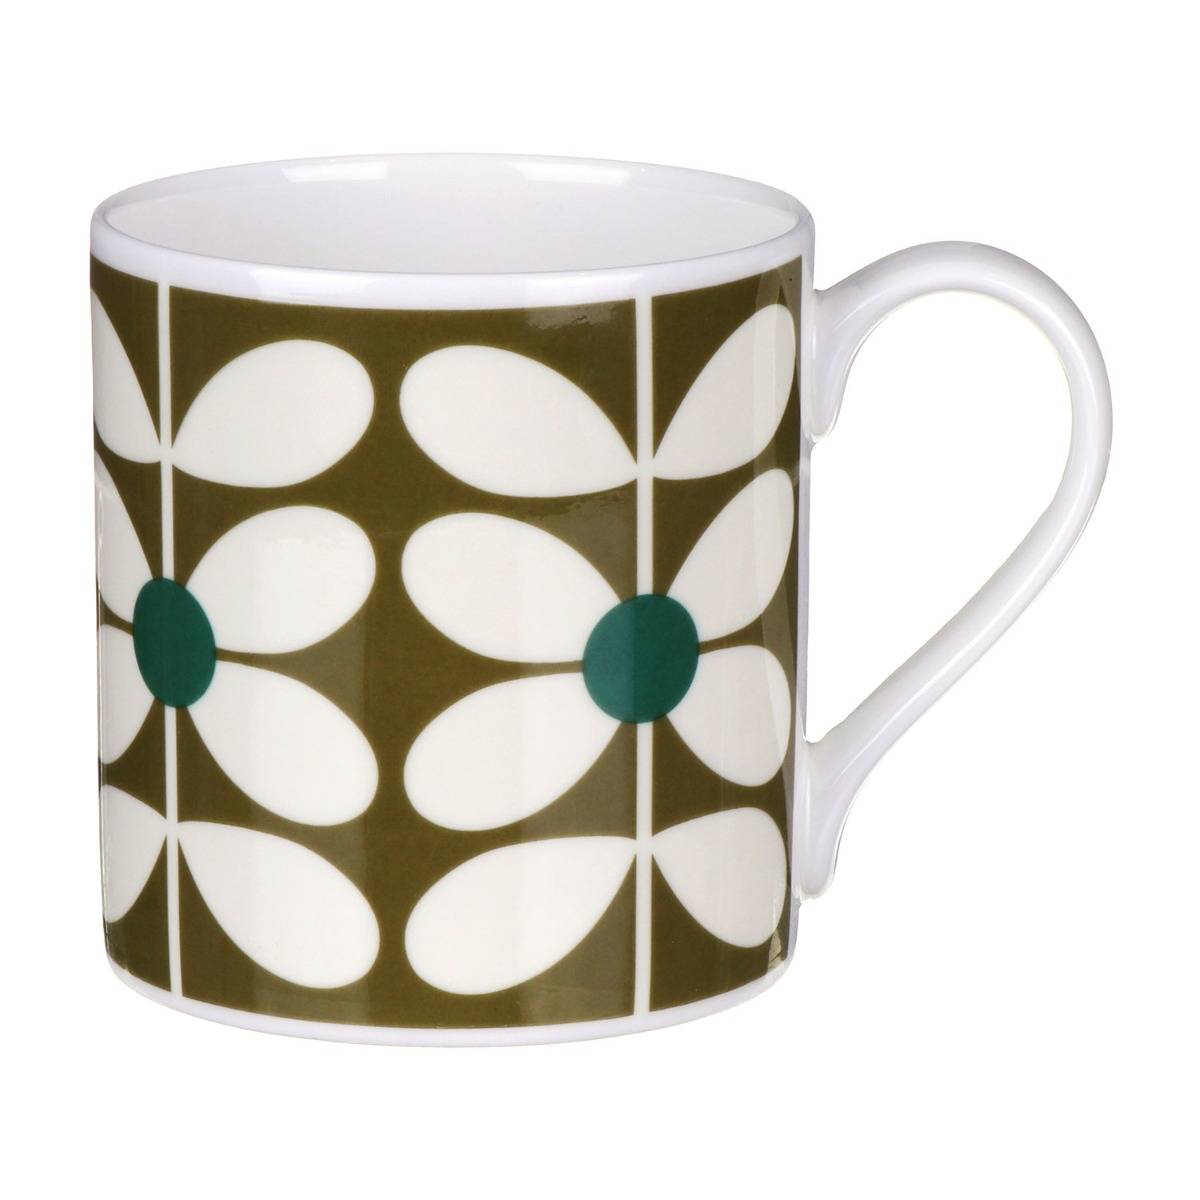 Orla Kiely 60's Stem Olive Large Mug